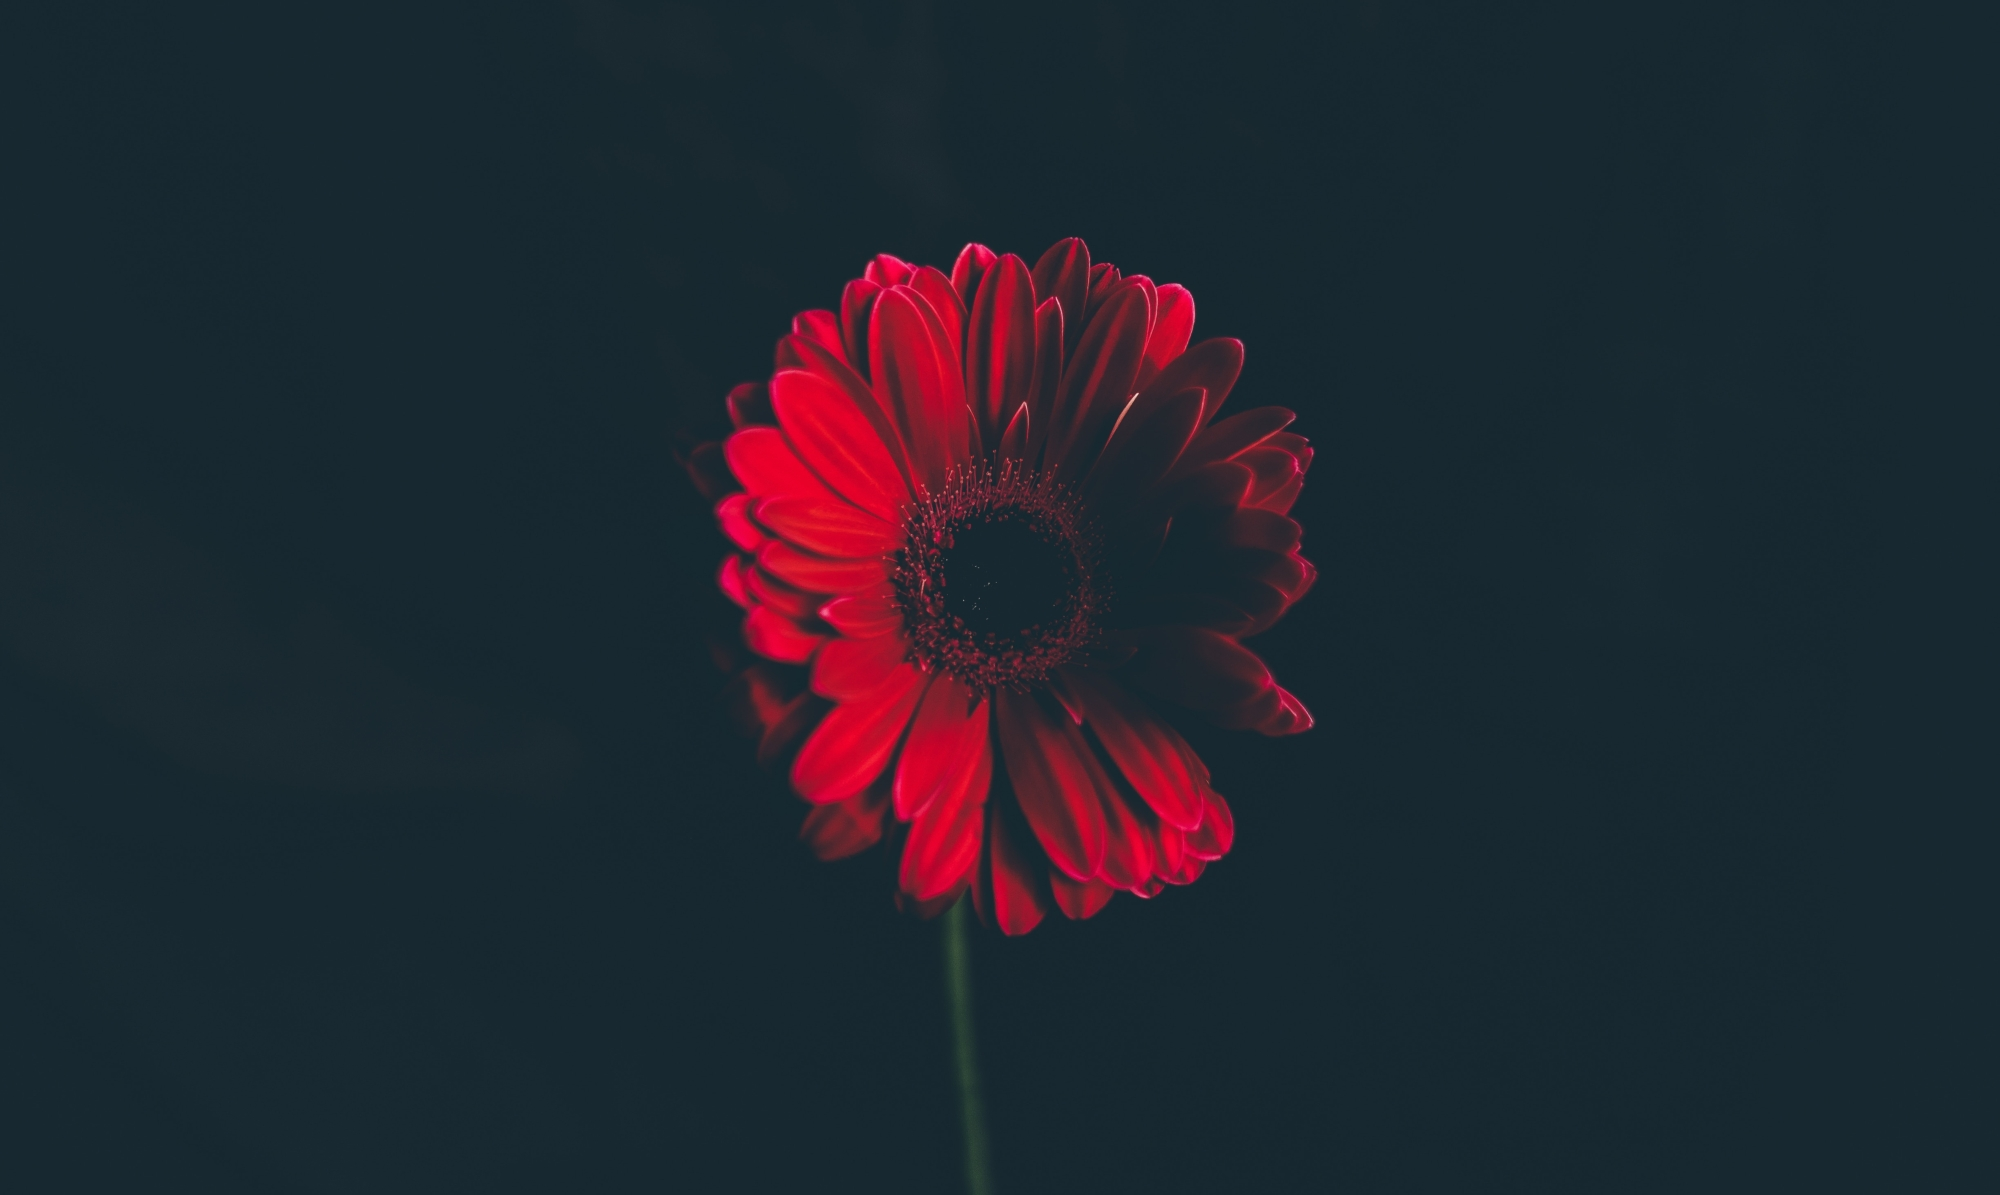 A photo of a red daisy on a black background by Annie Spratt on Unsplash